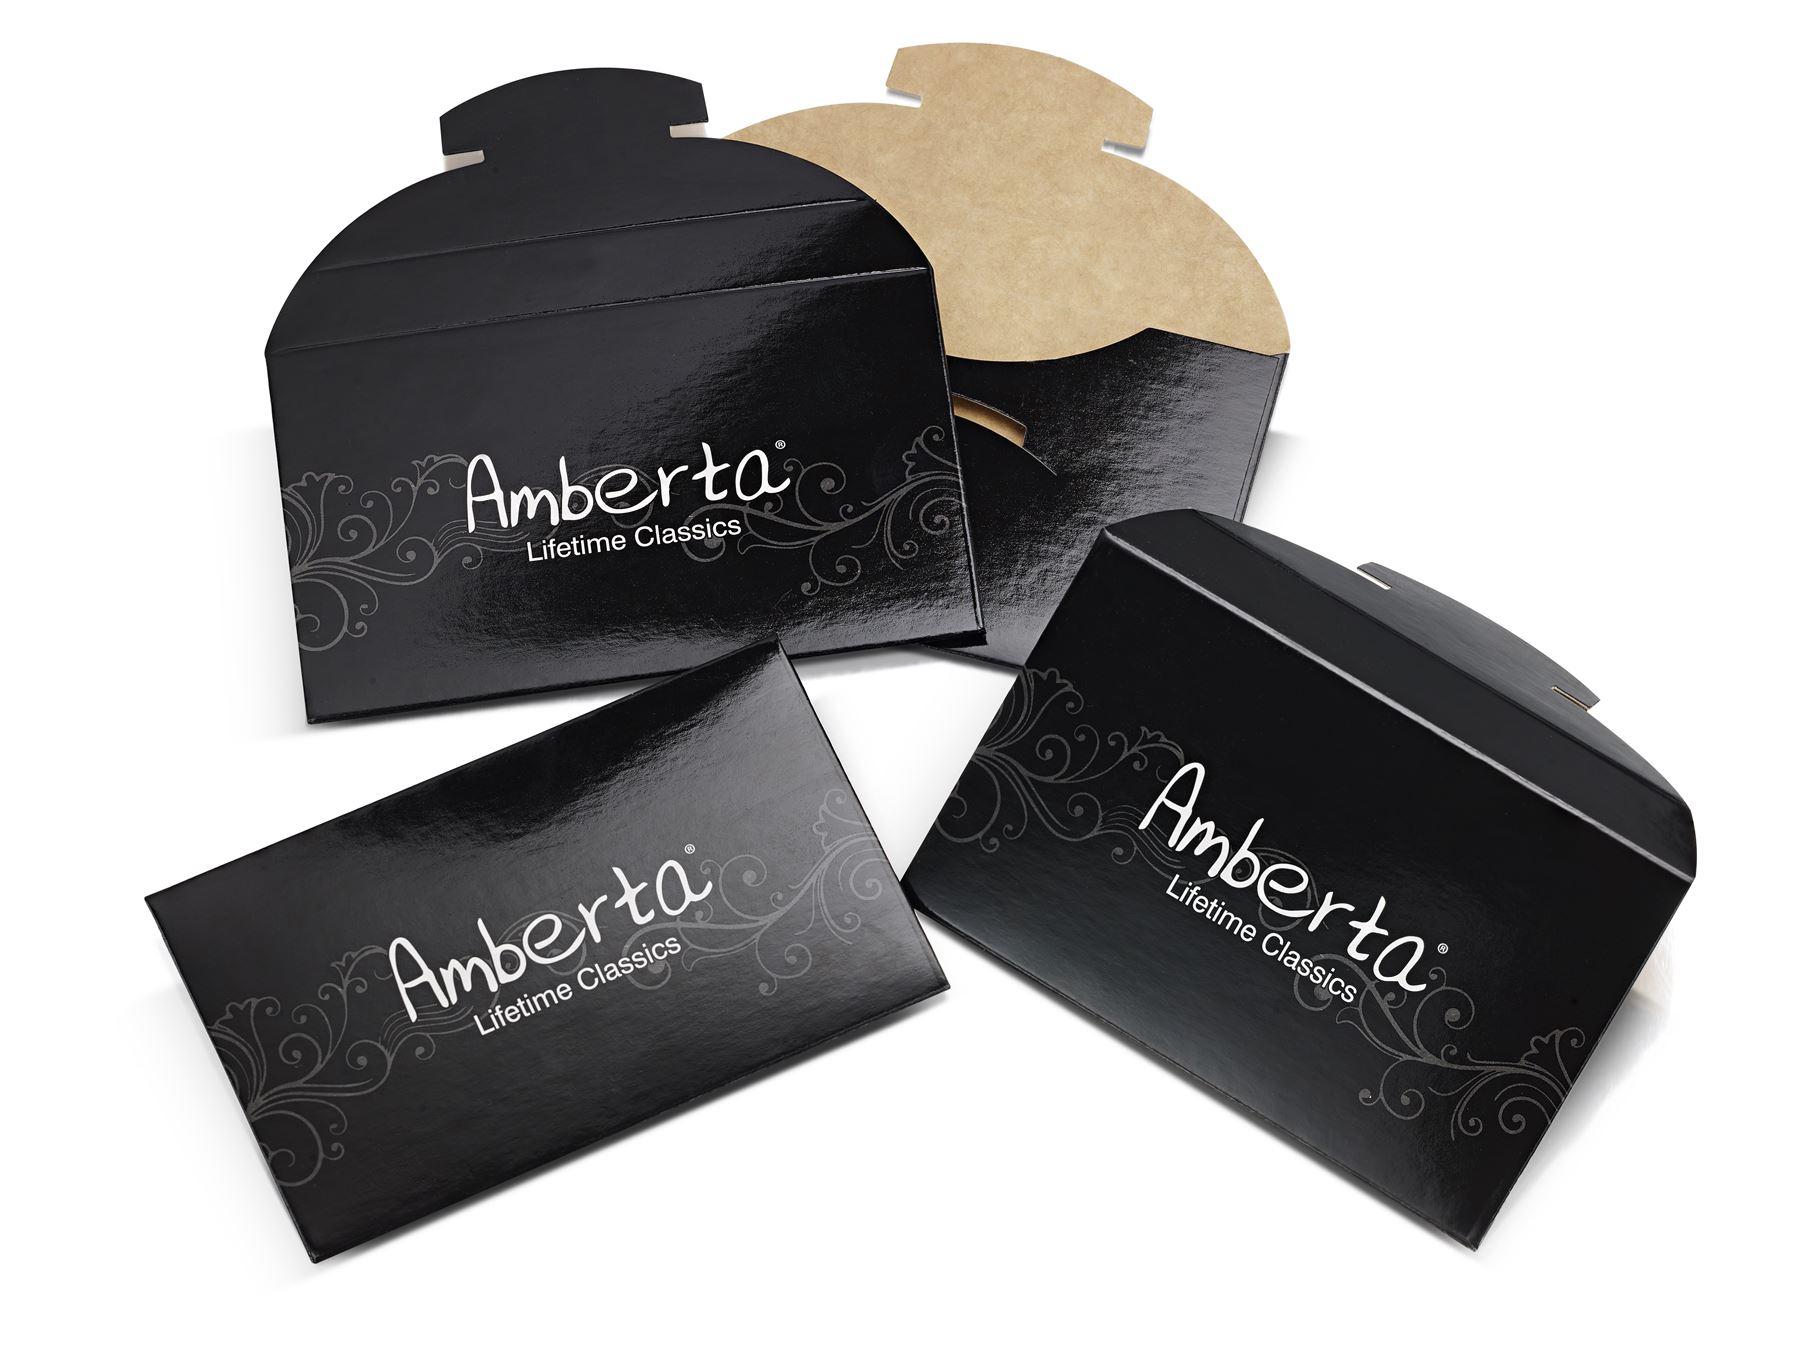 Amberta-Jewelry-925-Sterling-Silver-Adjustable-Bracelet-Italian-Bangle-for-Women miniature 4